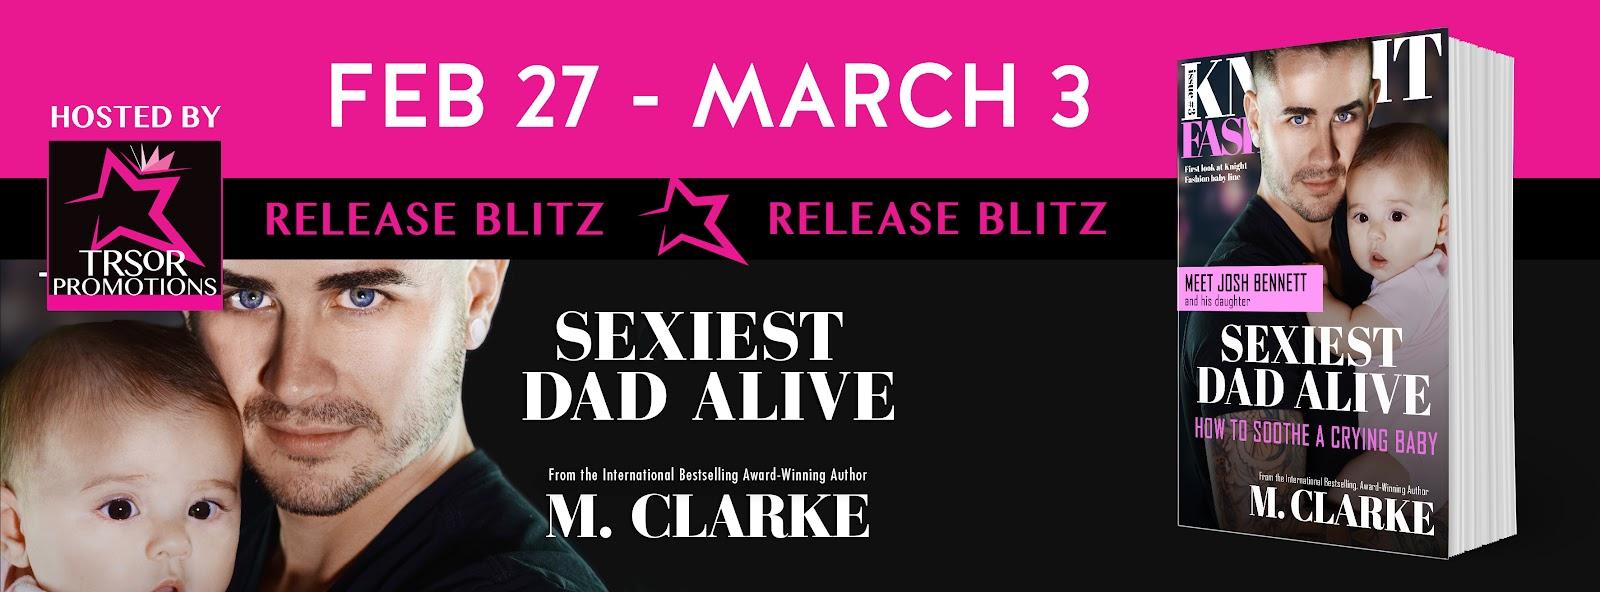 SEXIEST_DAD_RELEASE_BLITZ.jpg